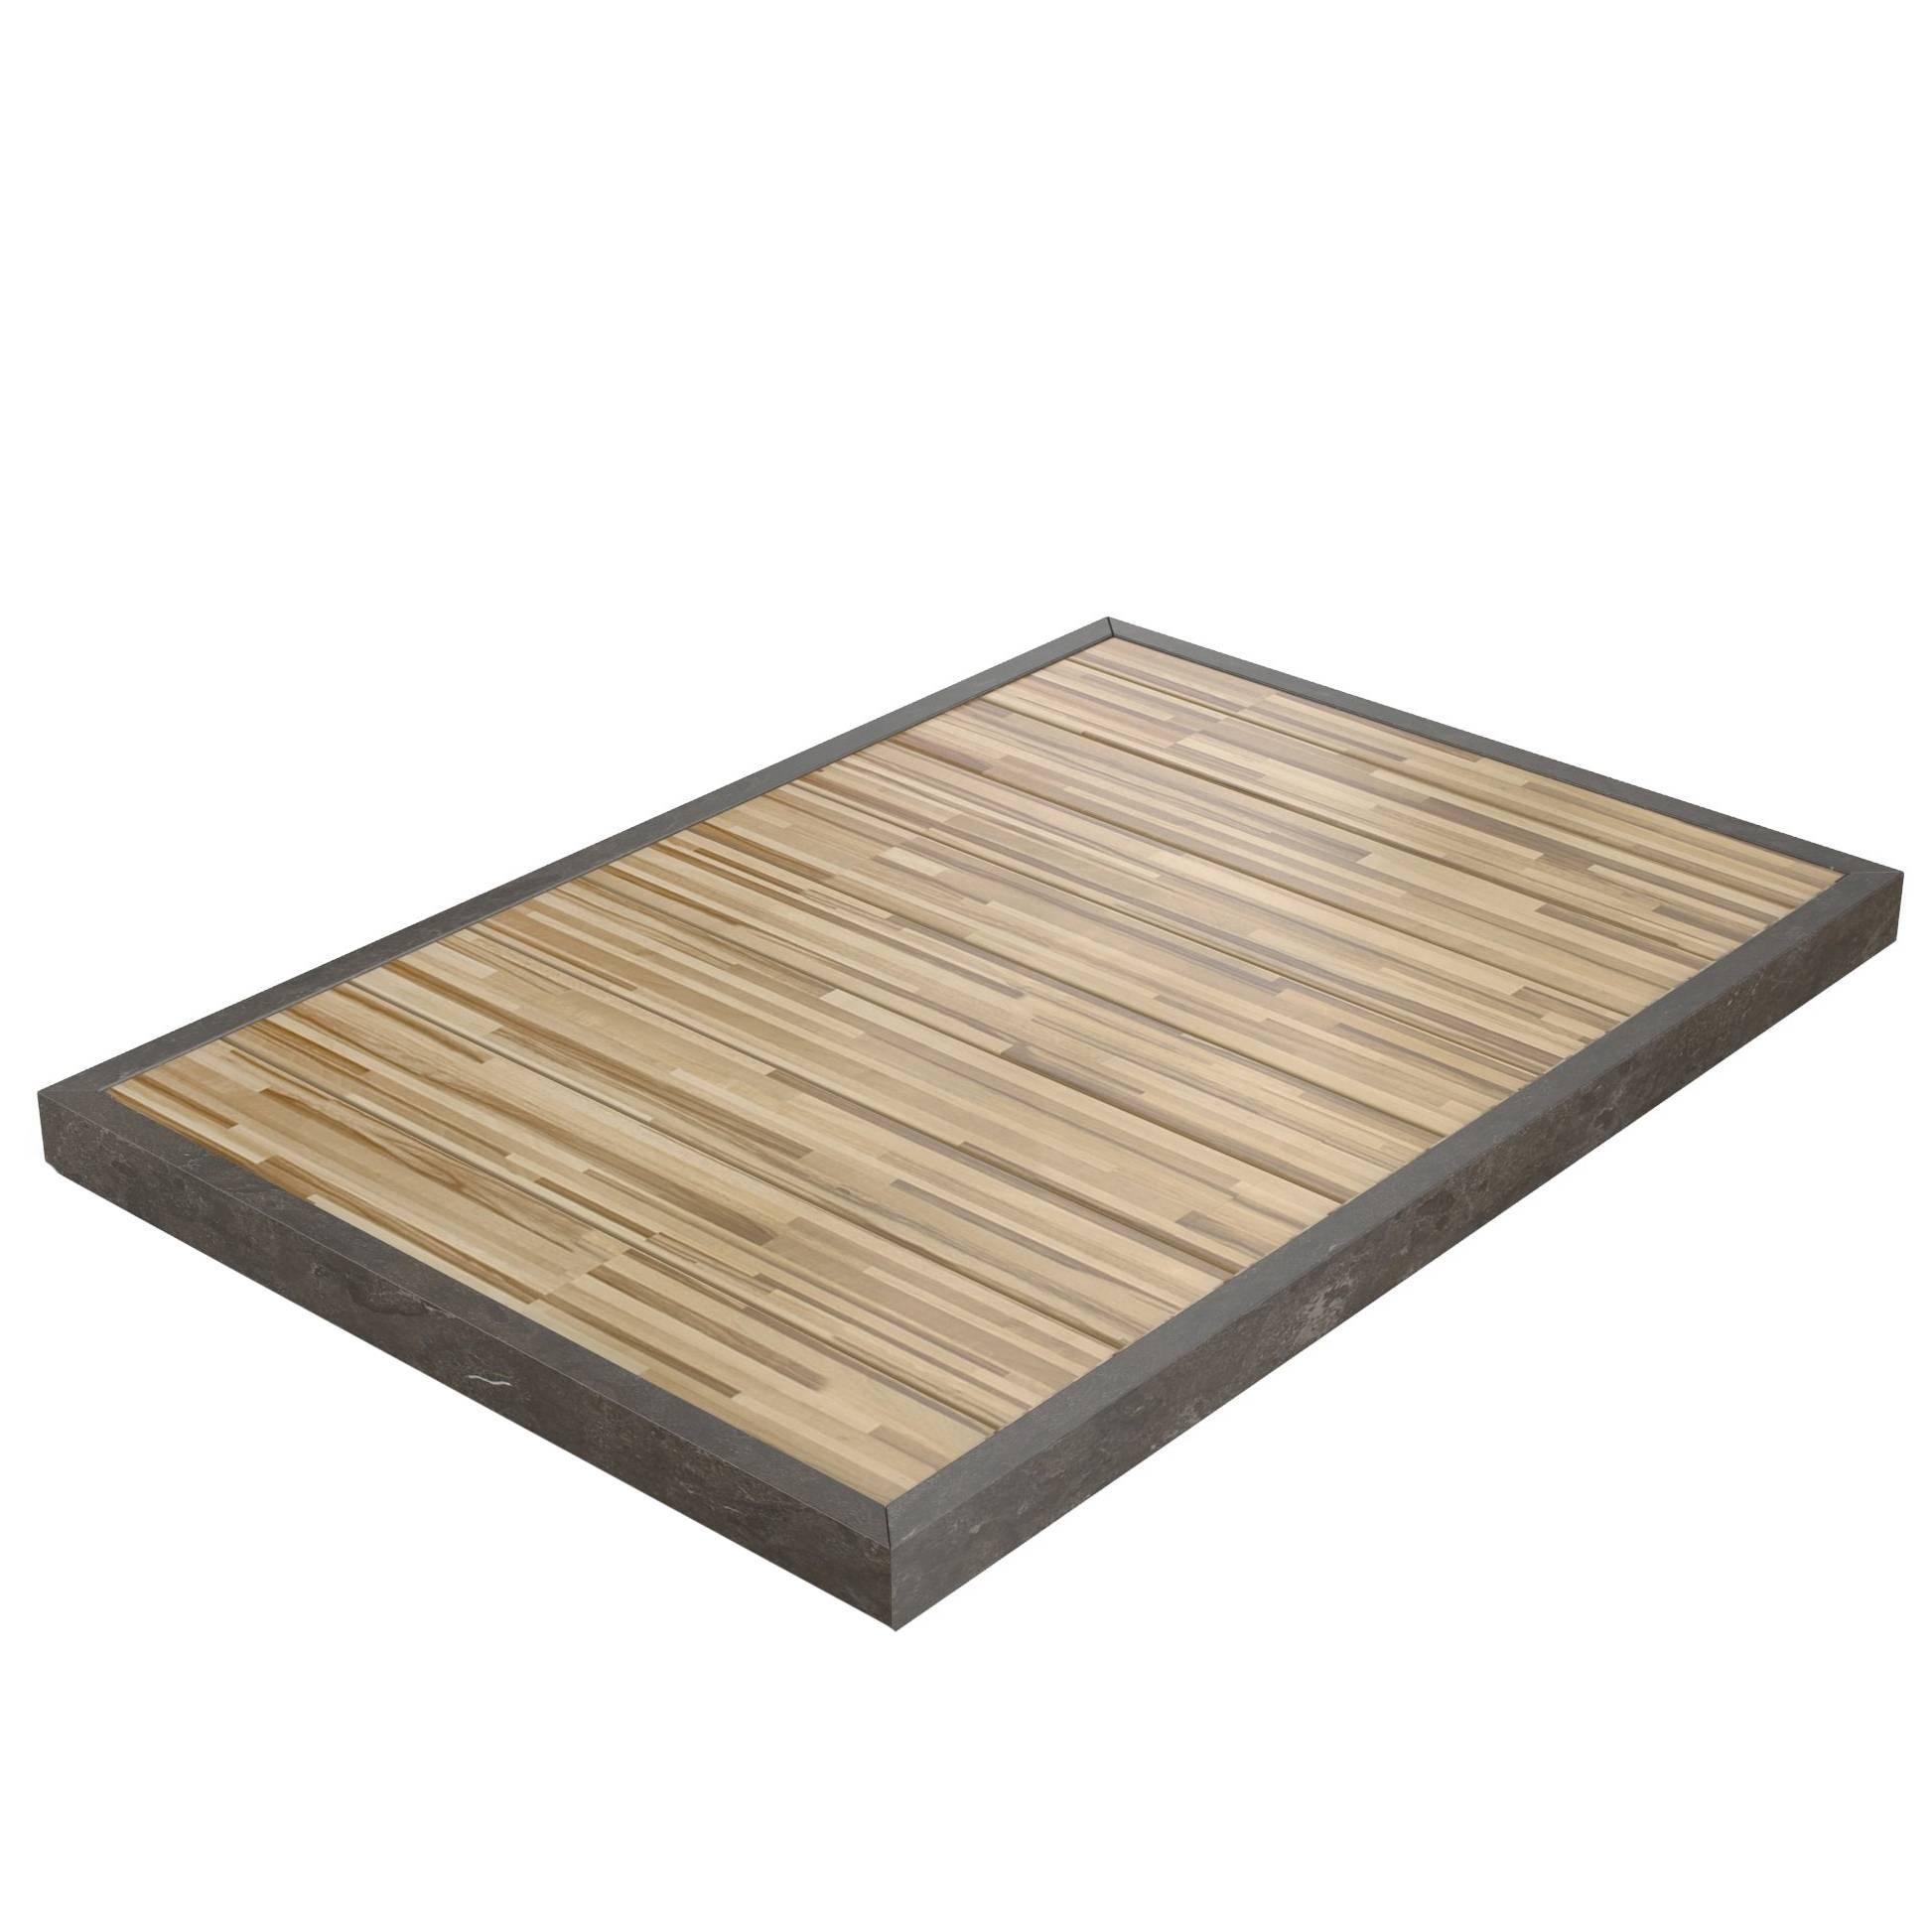 Salvatori Ishiburo Shower Tray In Pietra Du0027Avola U0026 Teak Wood By Kengo Kuma  For